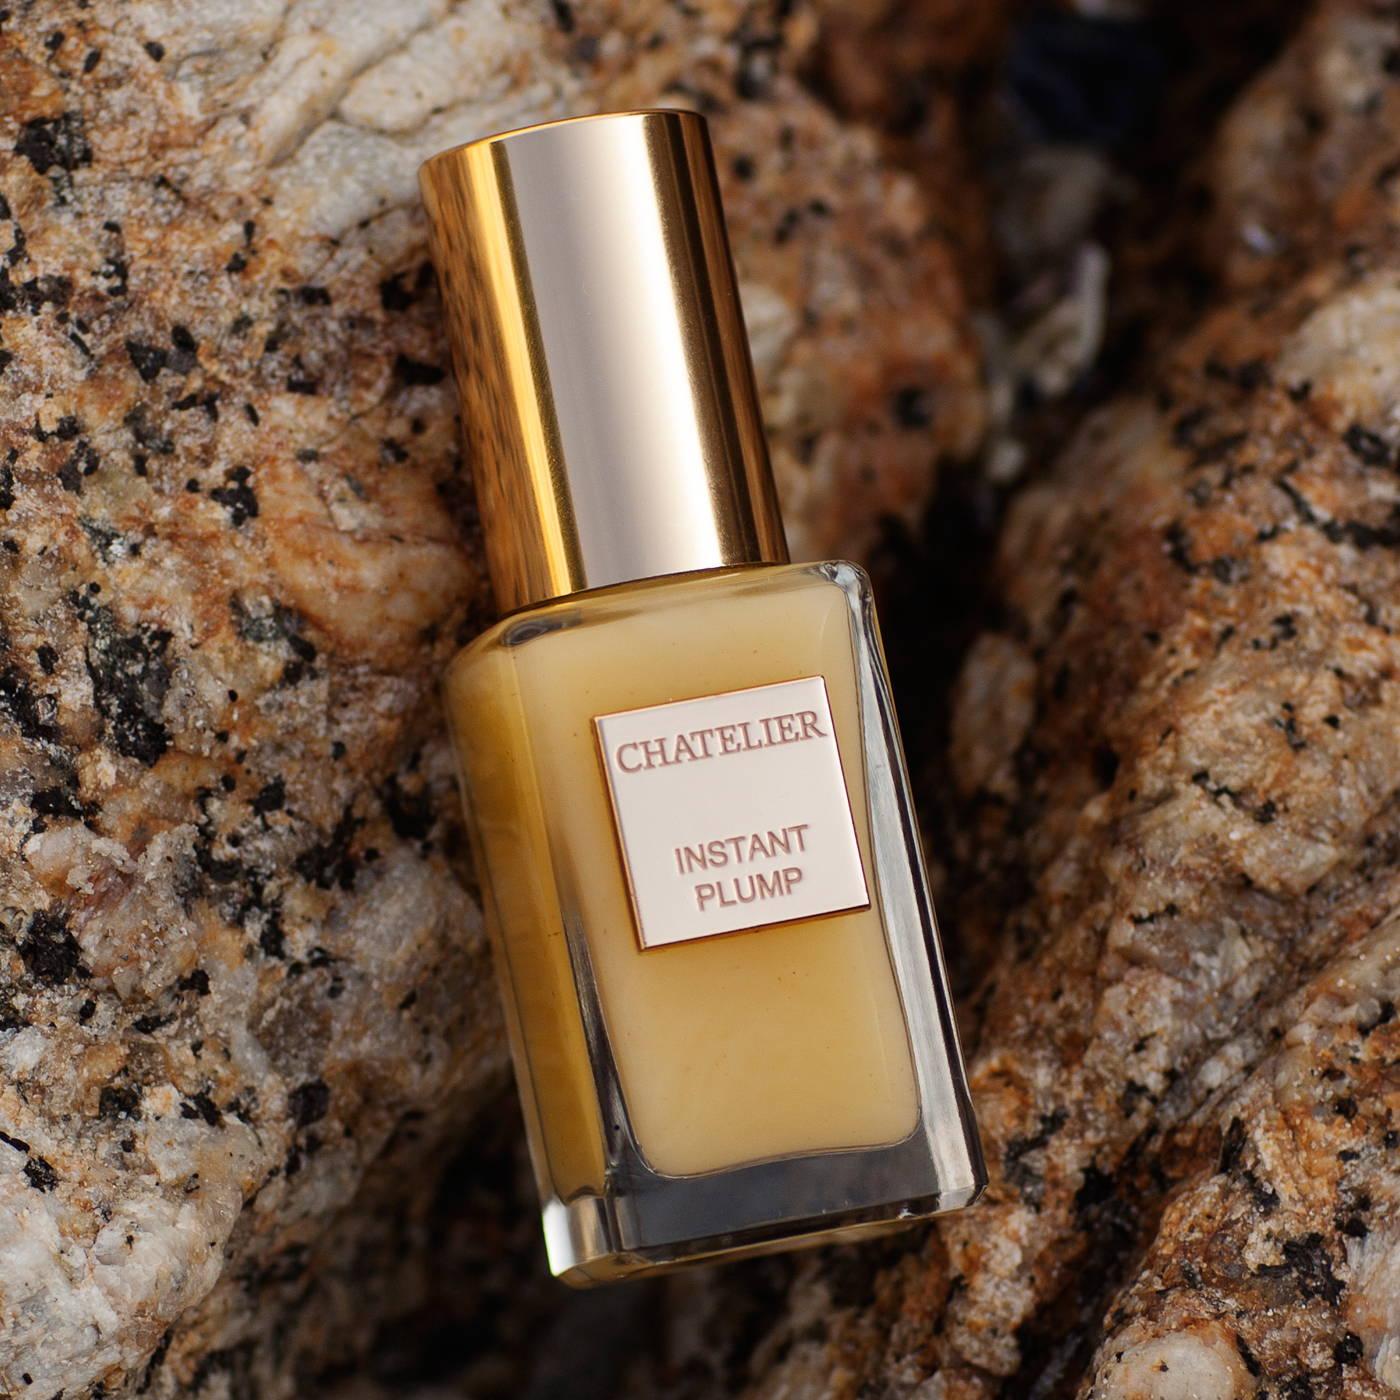 chatelier instant plump serum